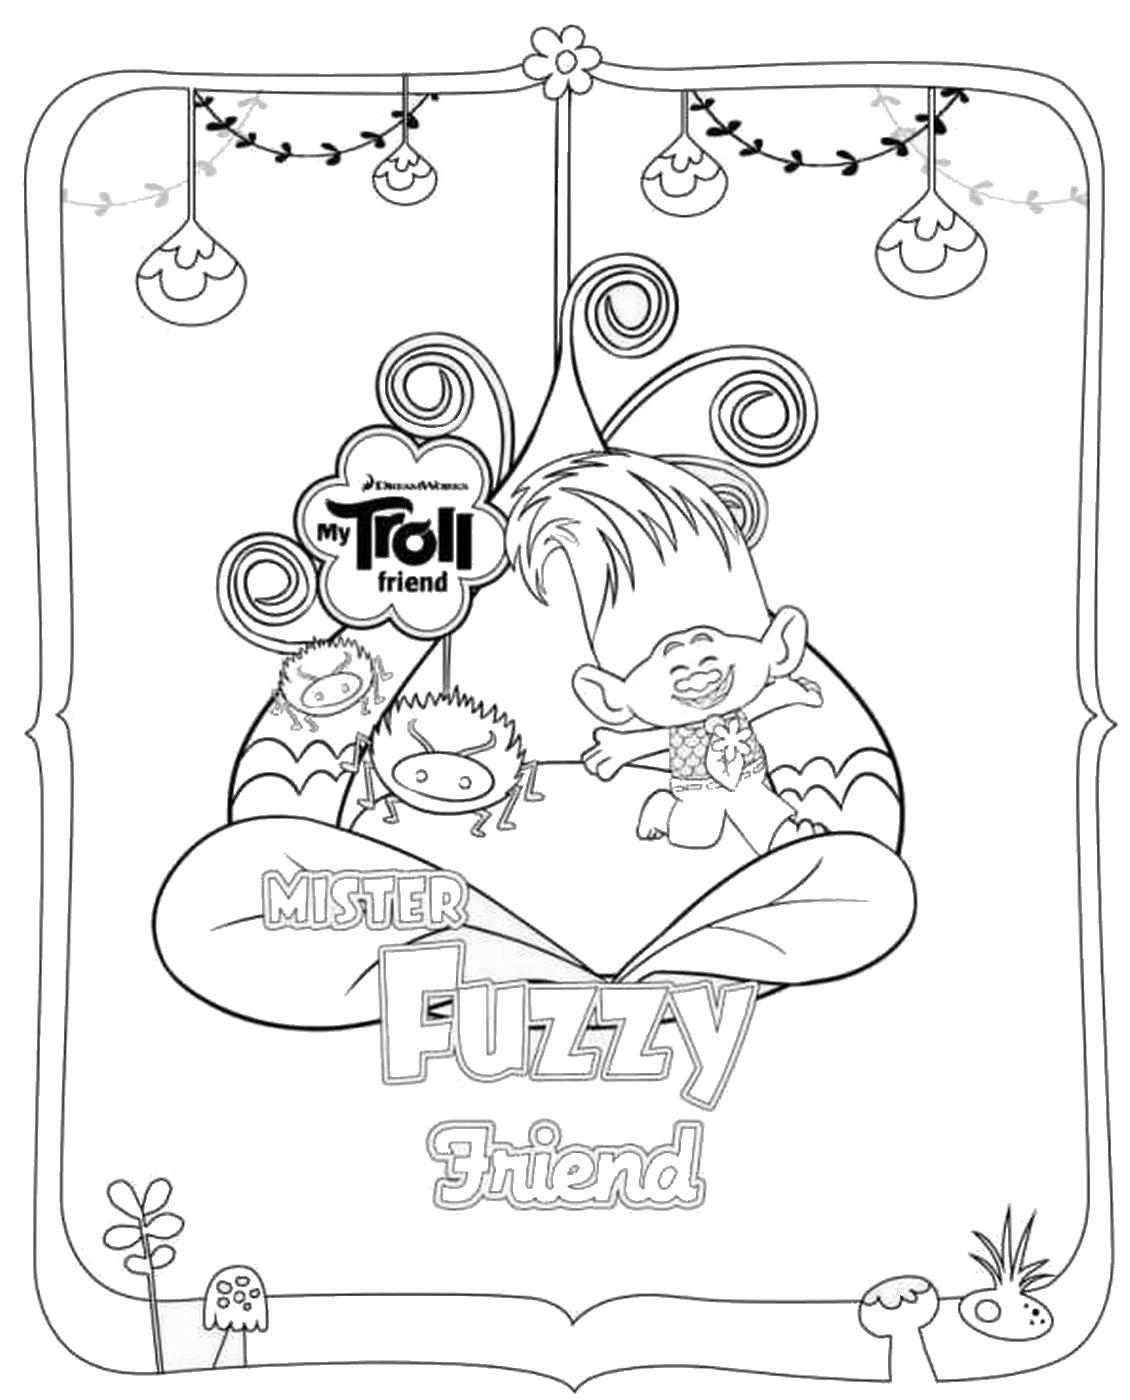 Les Trolls : Mister Fuzzy Friend